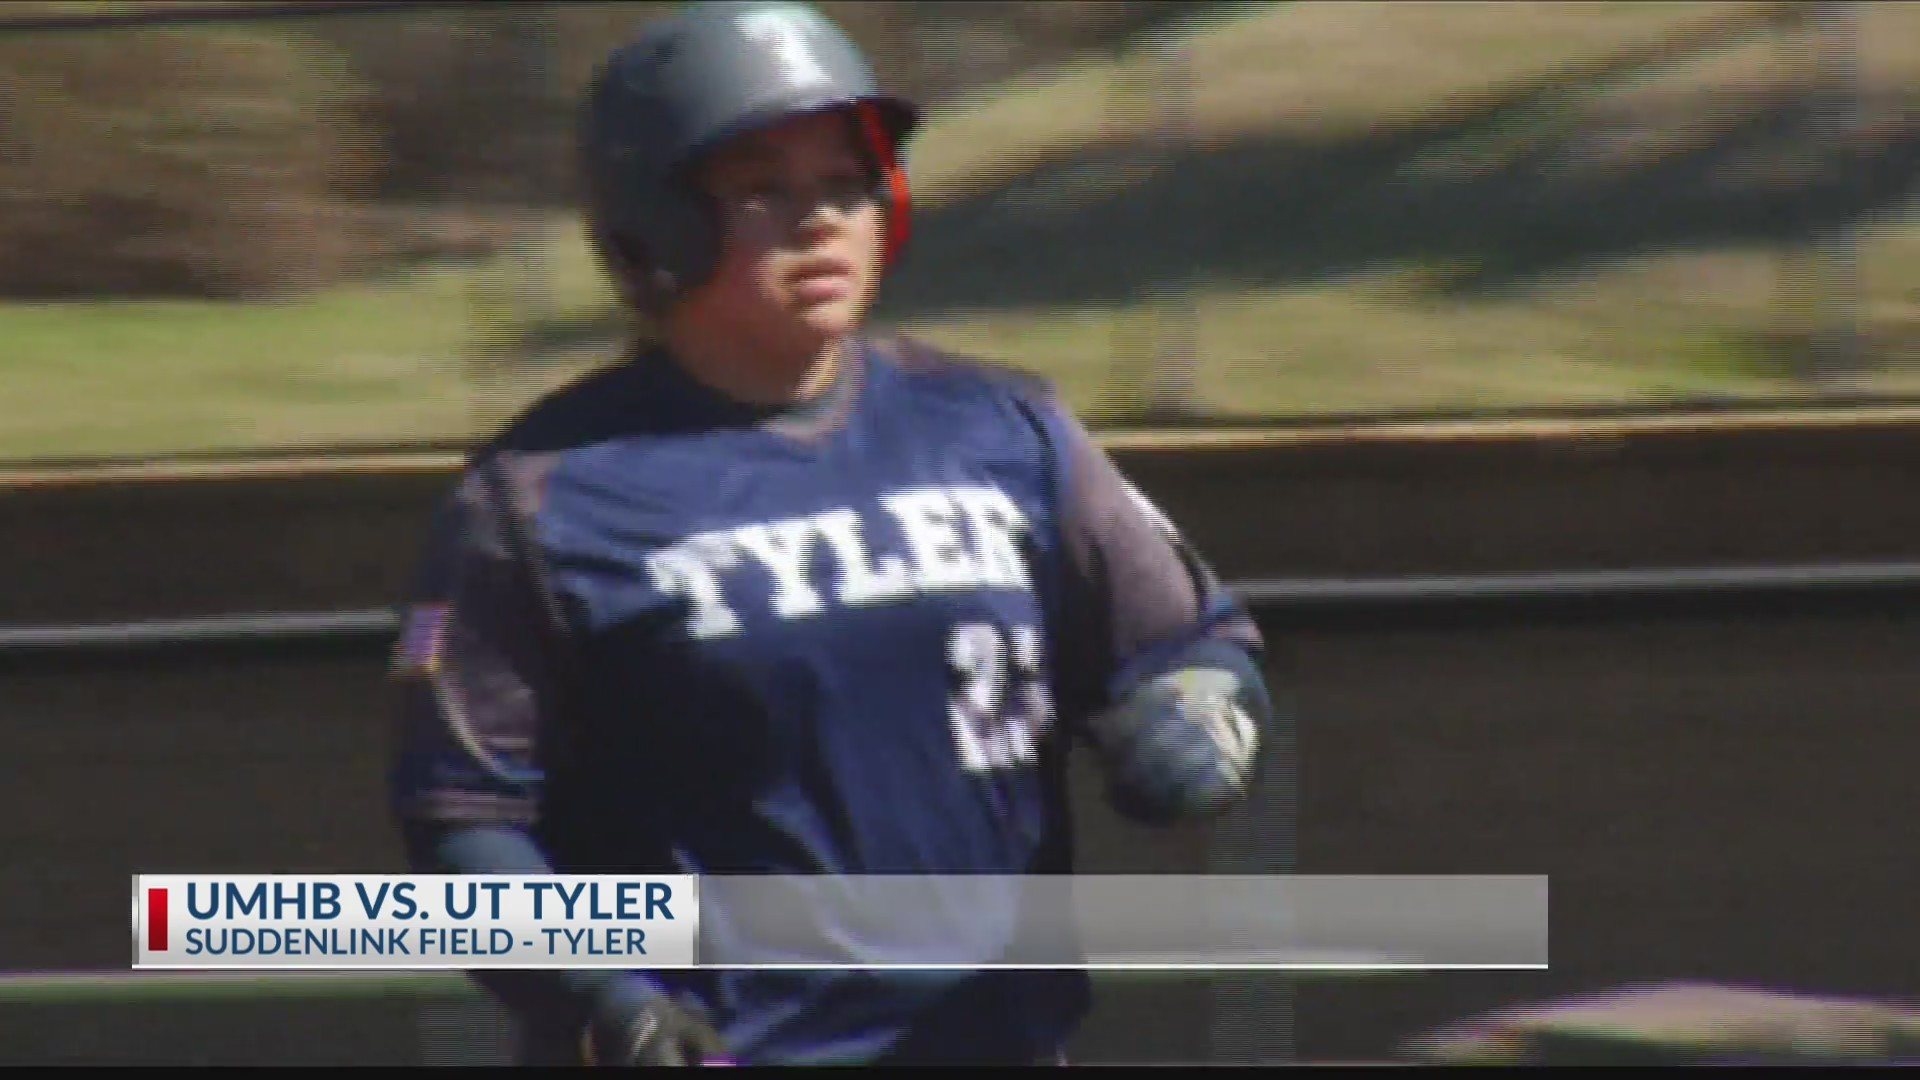 UT_Tyler_softball_beats_UMHB_7_1_0_20190317033707